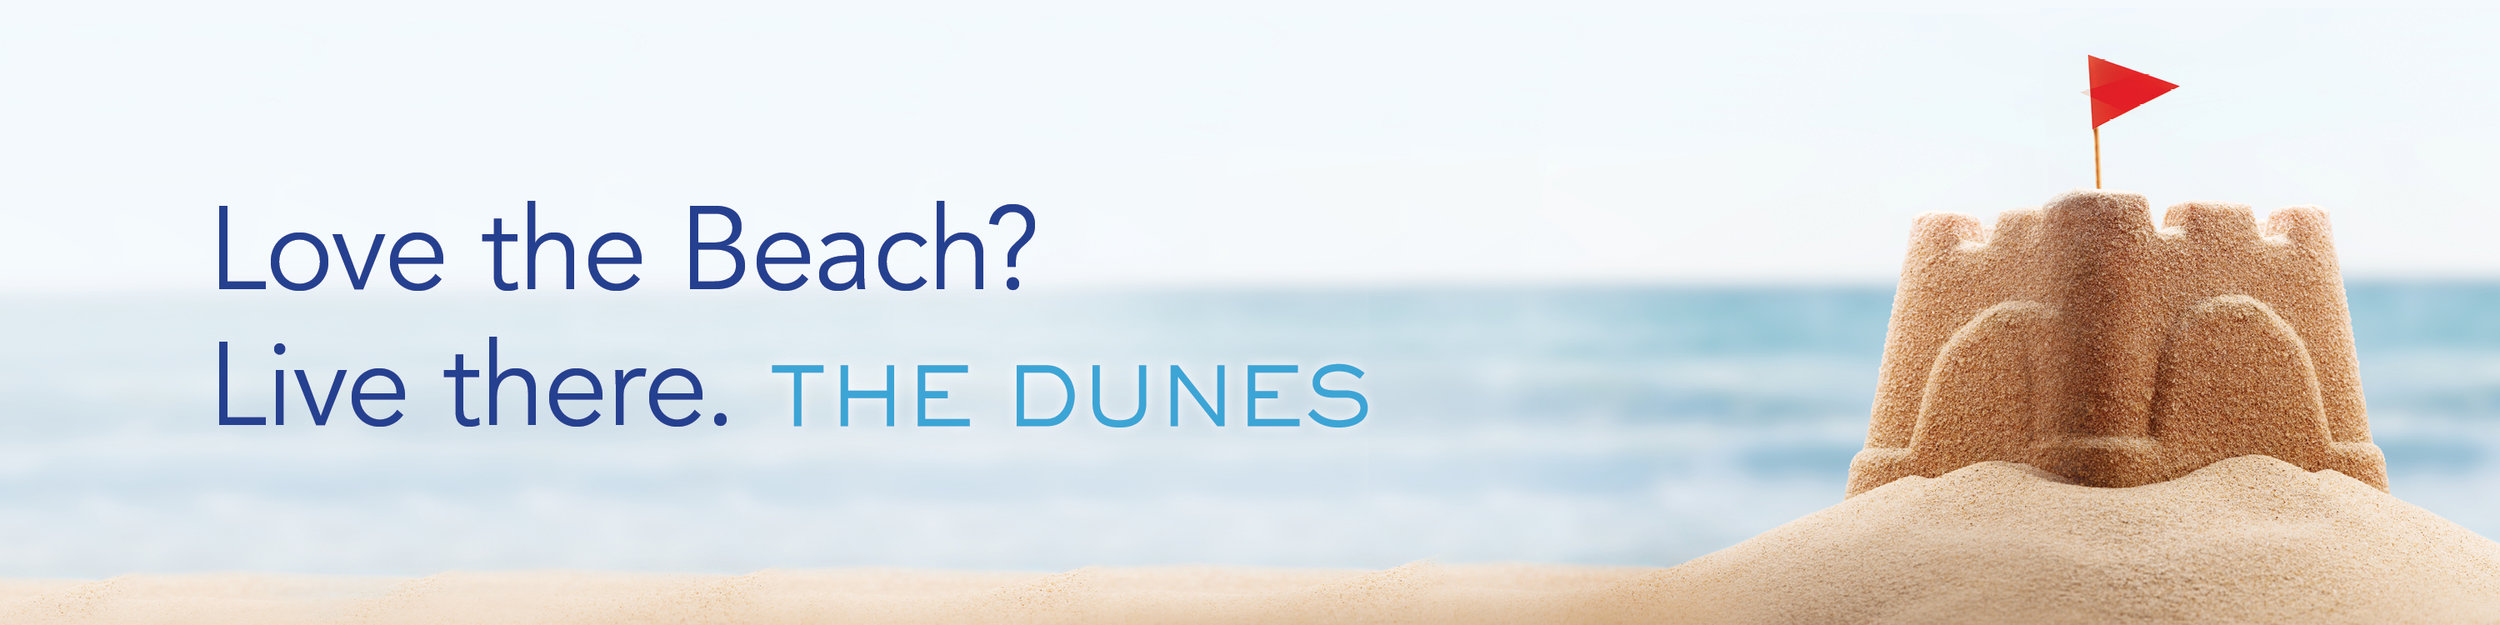 Billboard advertisement The Dunes Shea Homes